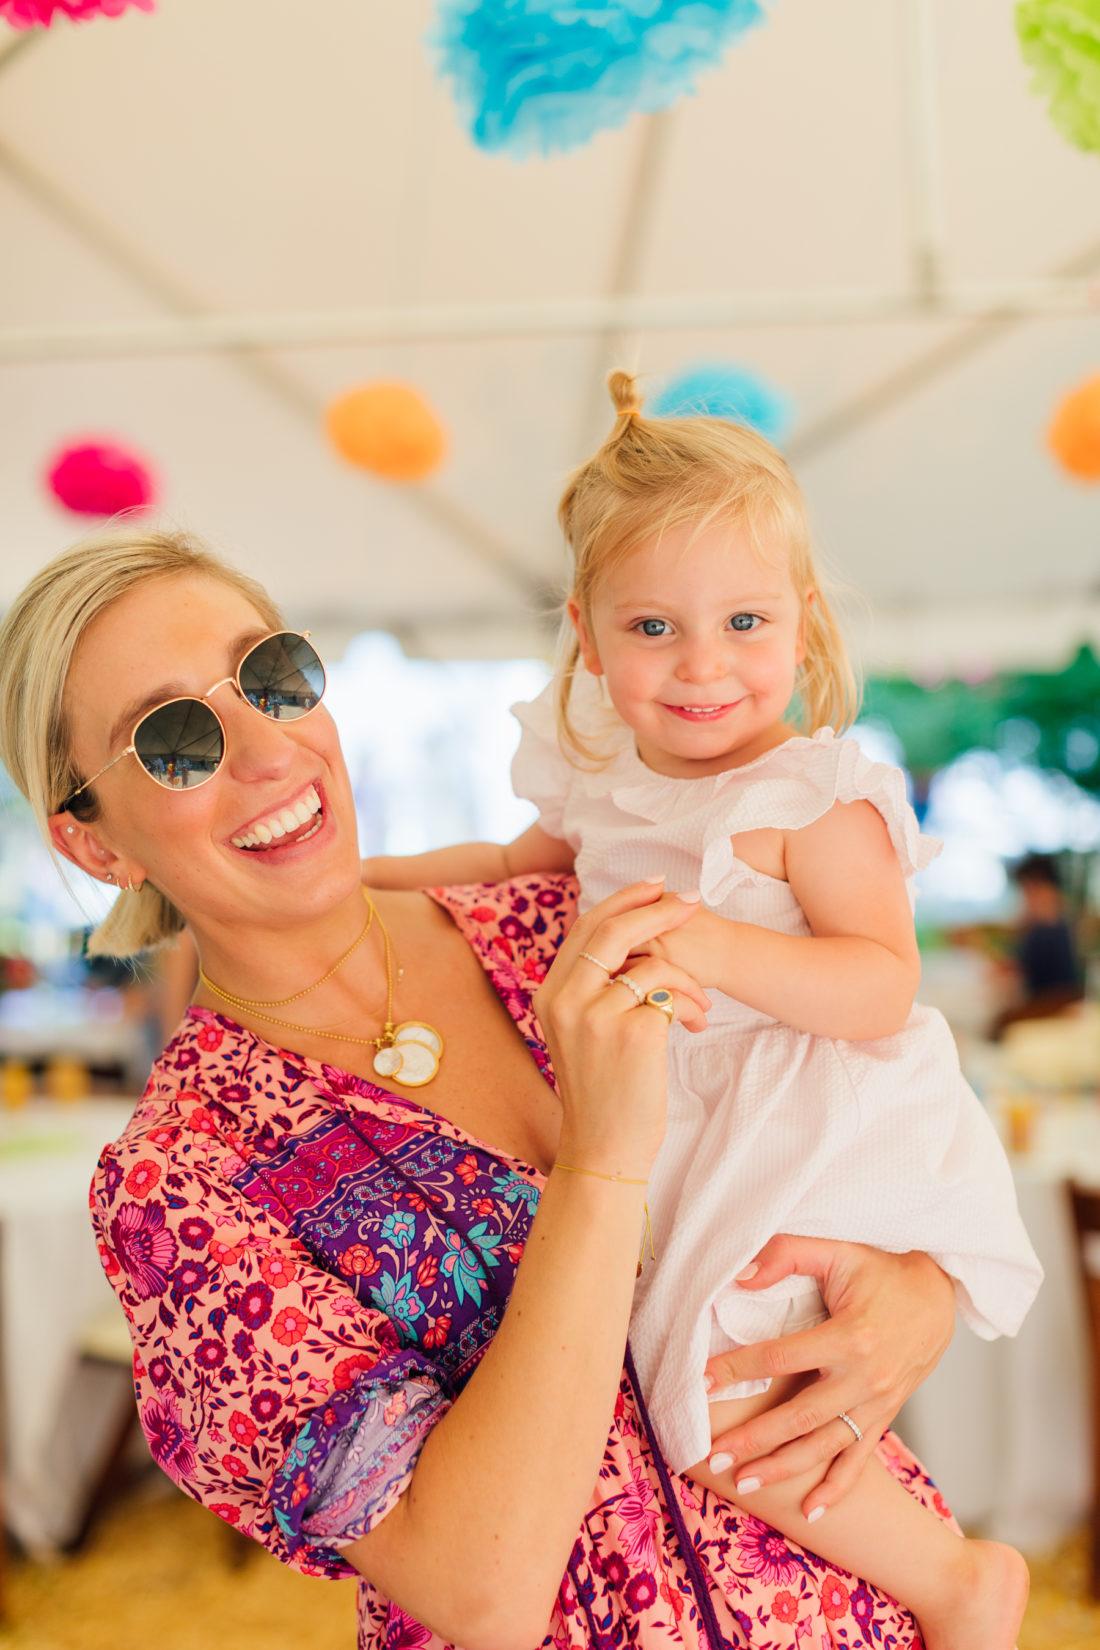 Blogger Julia Dzafic of Lemon Stripes and daughter Amalia dance at Marlowe Martino's Cinco de Marlowe themed 5th birthday fiesta